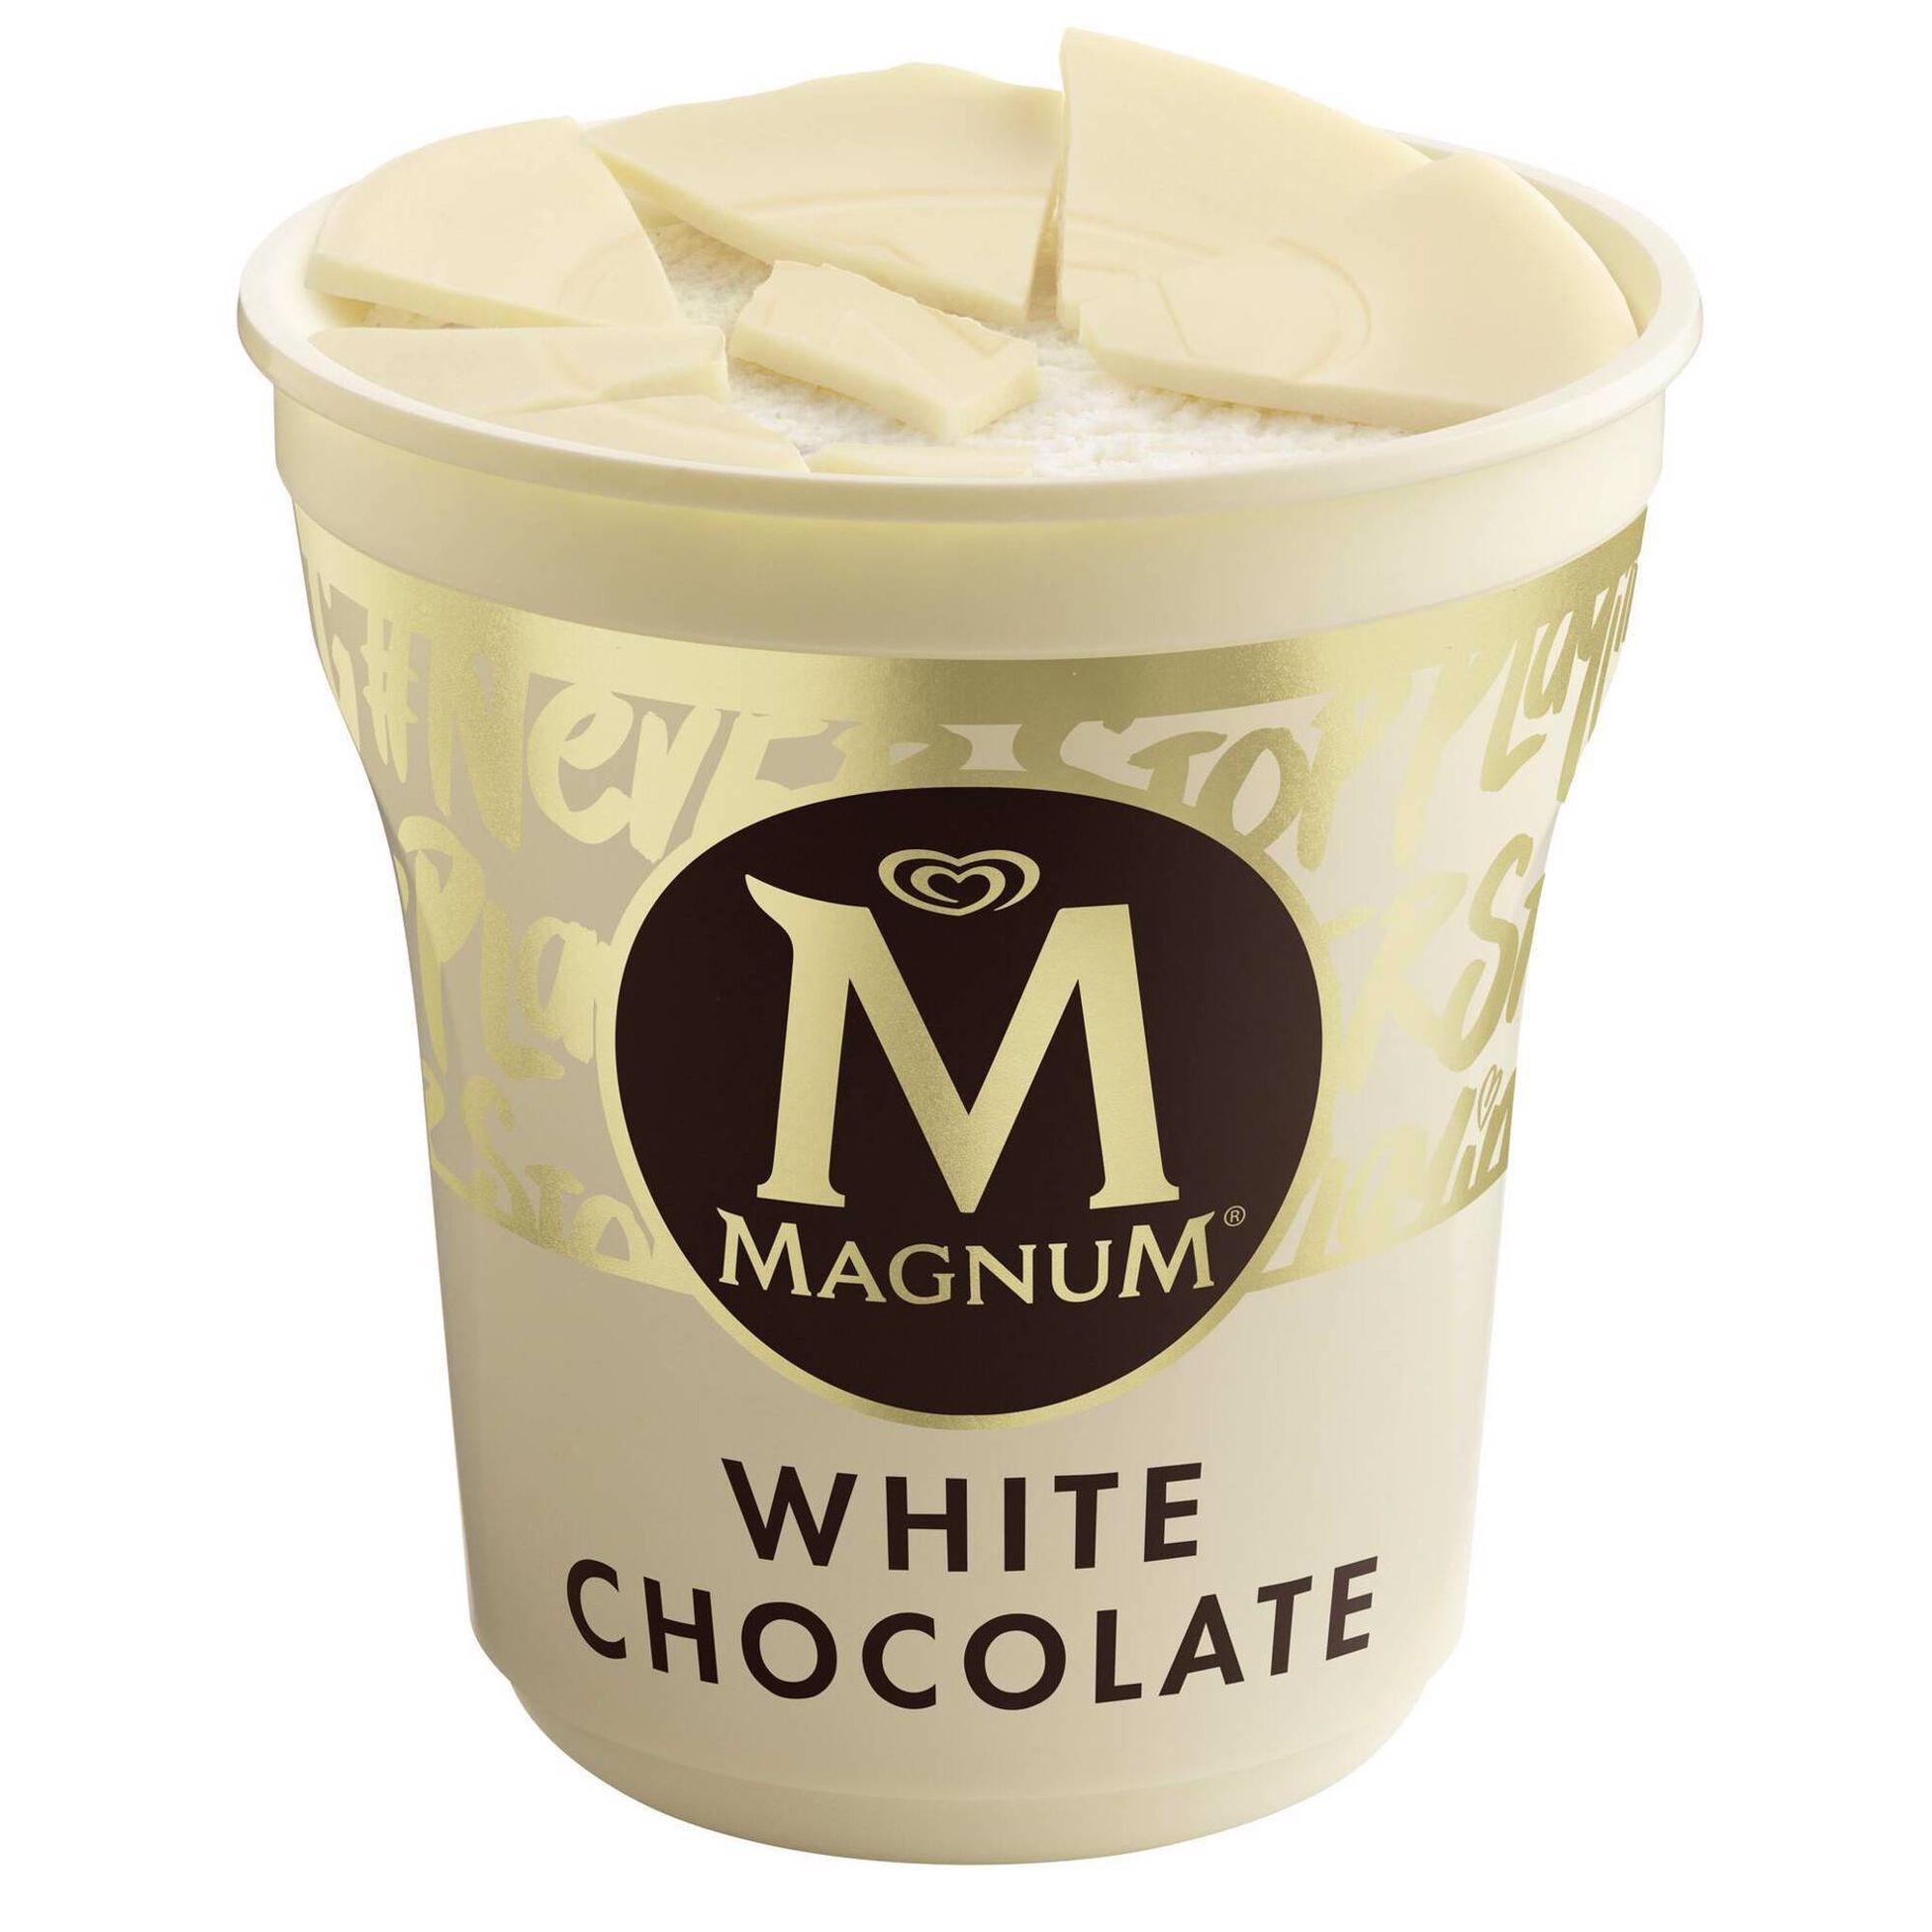 Gelado White Chocolate